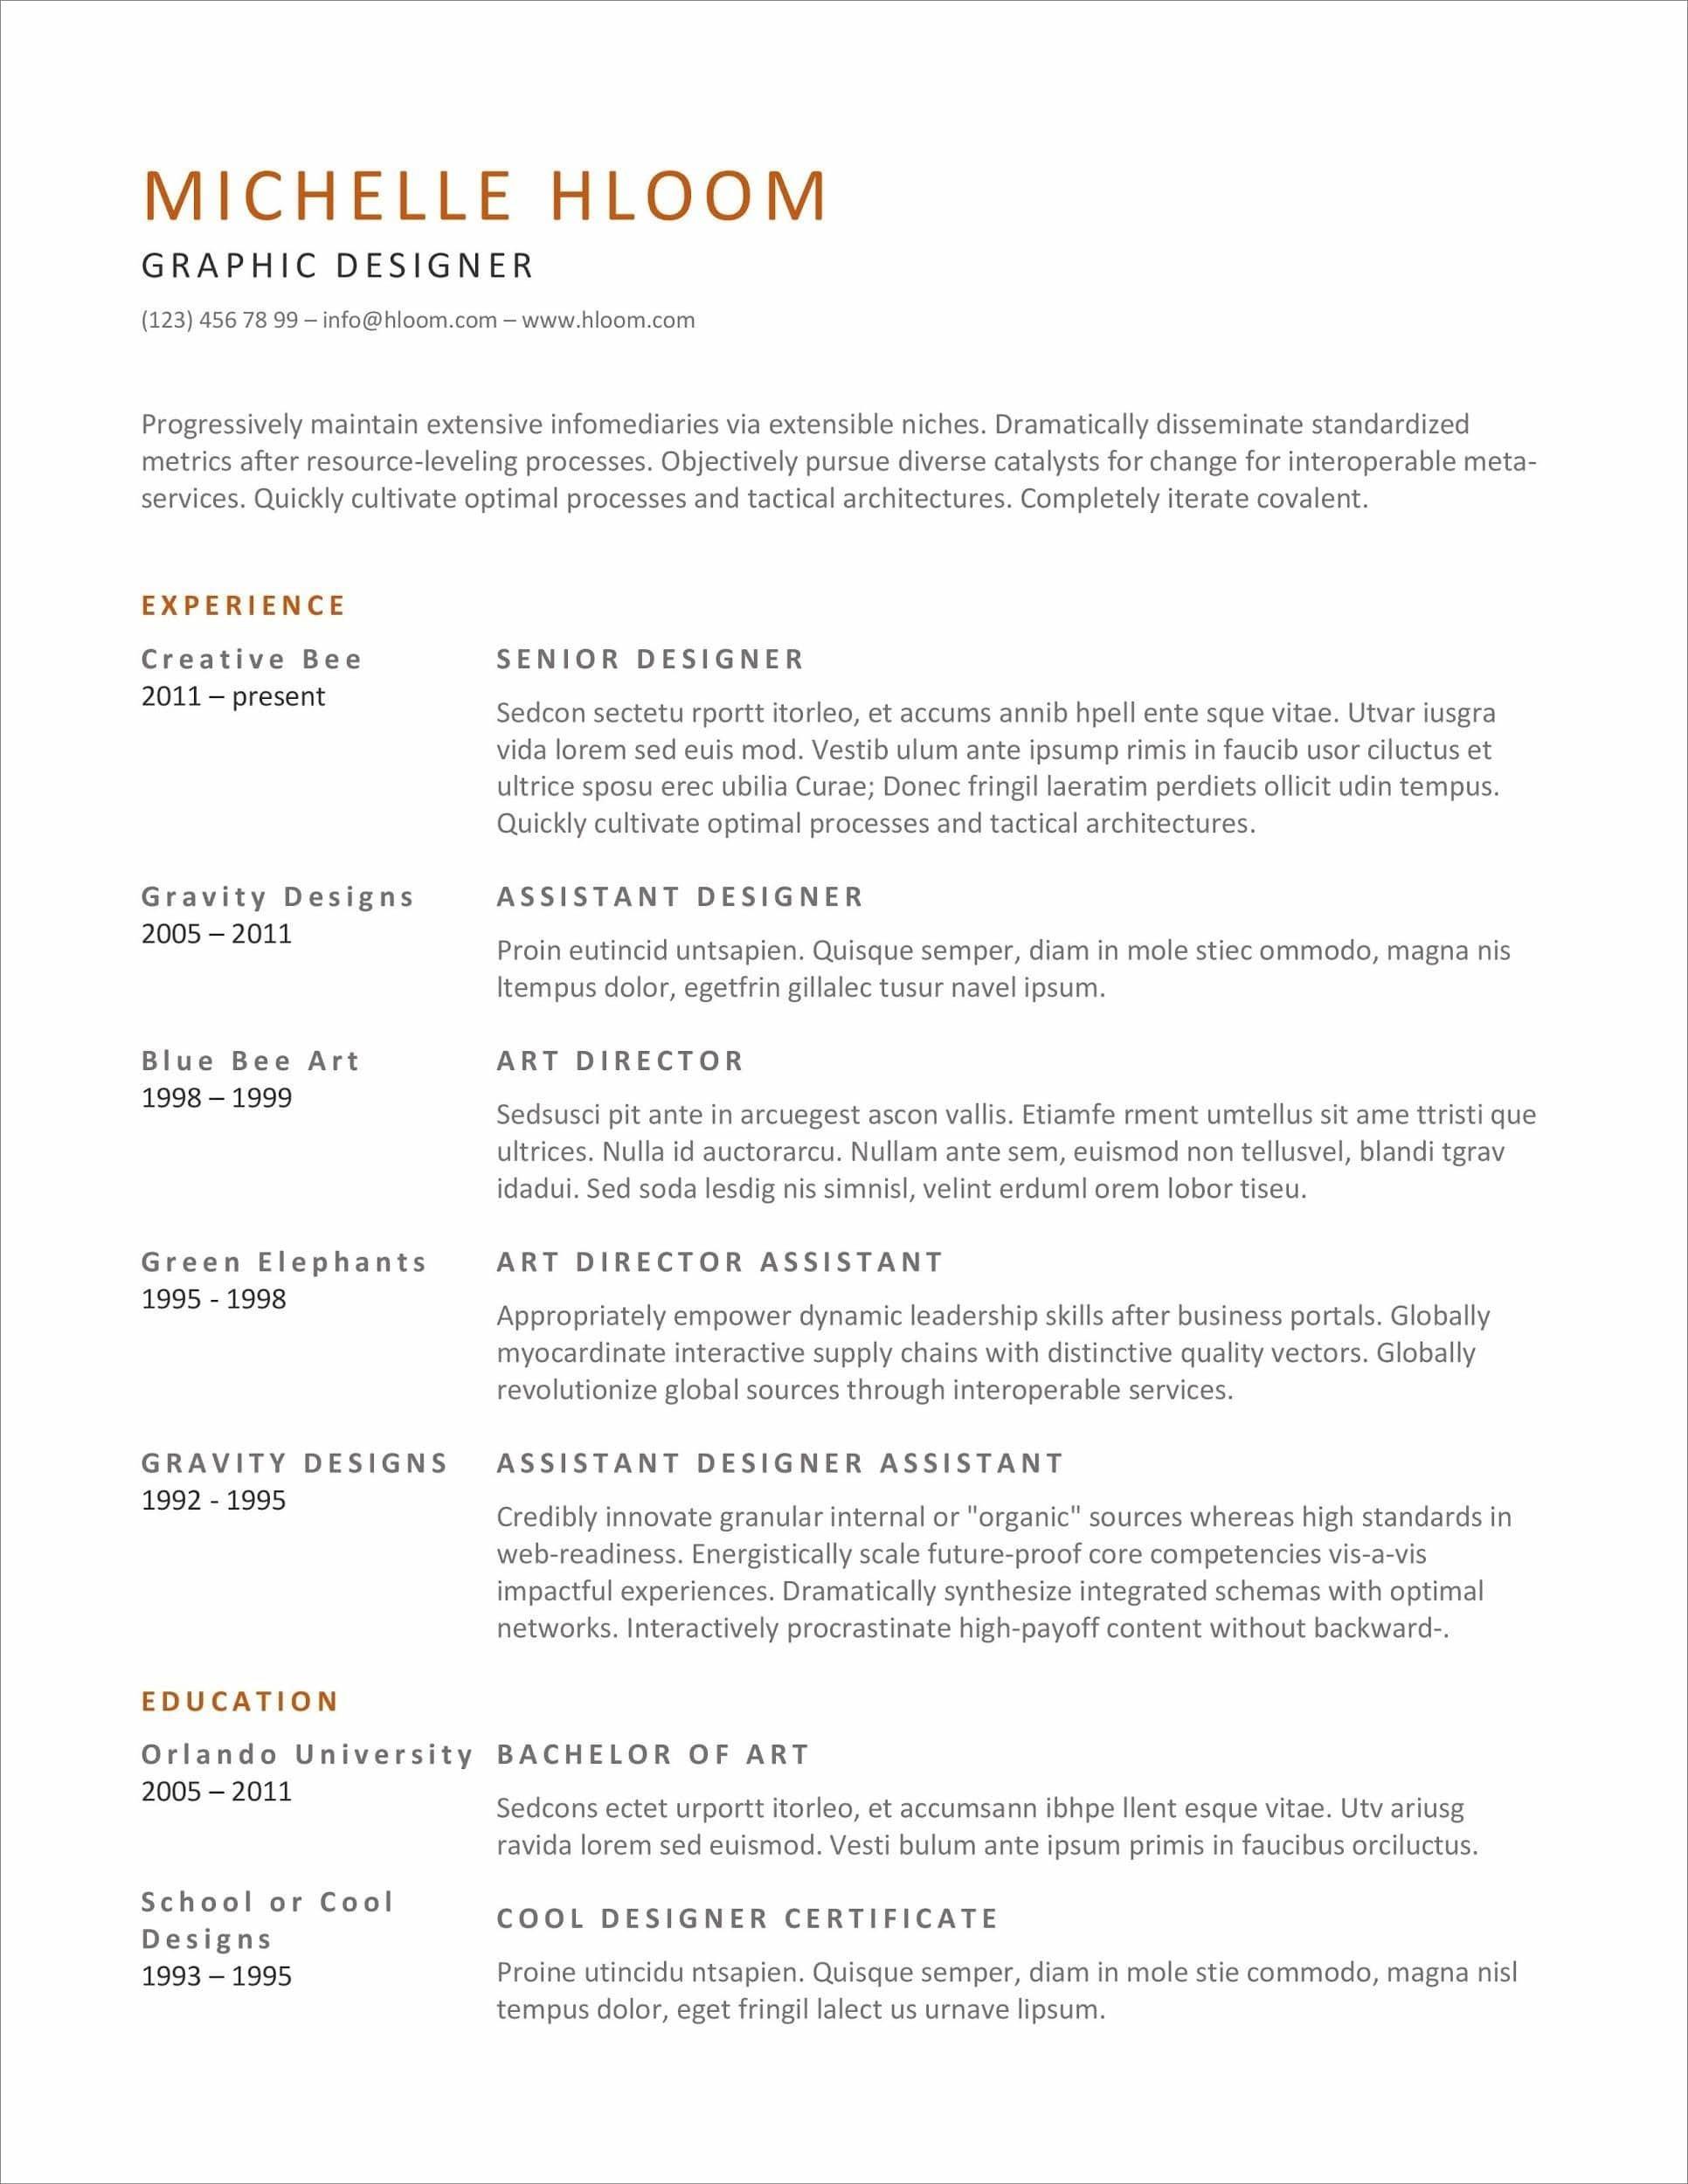 M Word Template Resume Idea  Ms Design Creative Free Download 2020Full